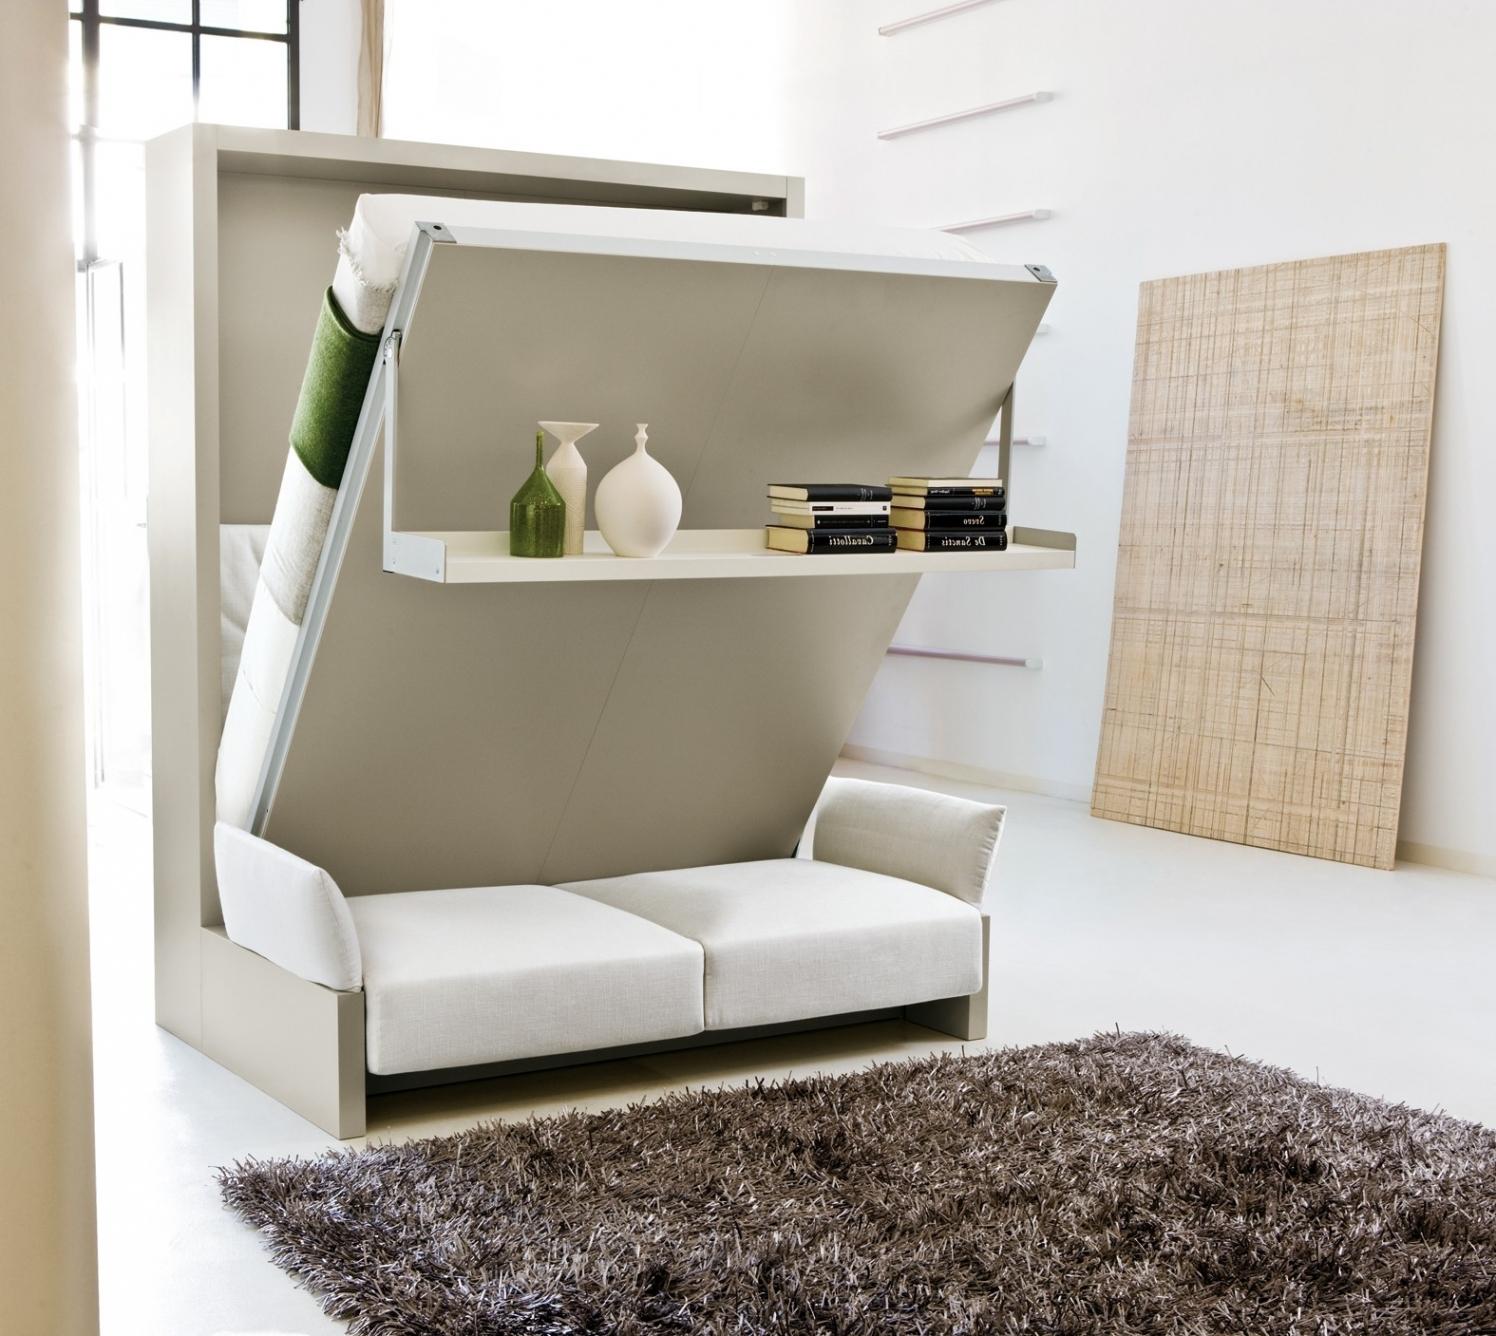 The Best and Elegant Sofa Sleeper Design for Your Home  FresHOUZcom